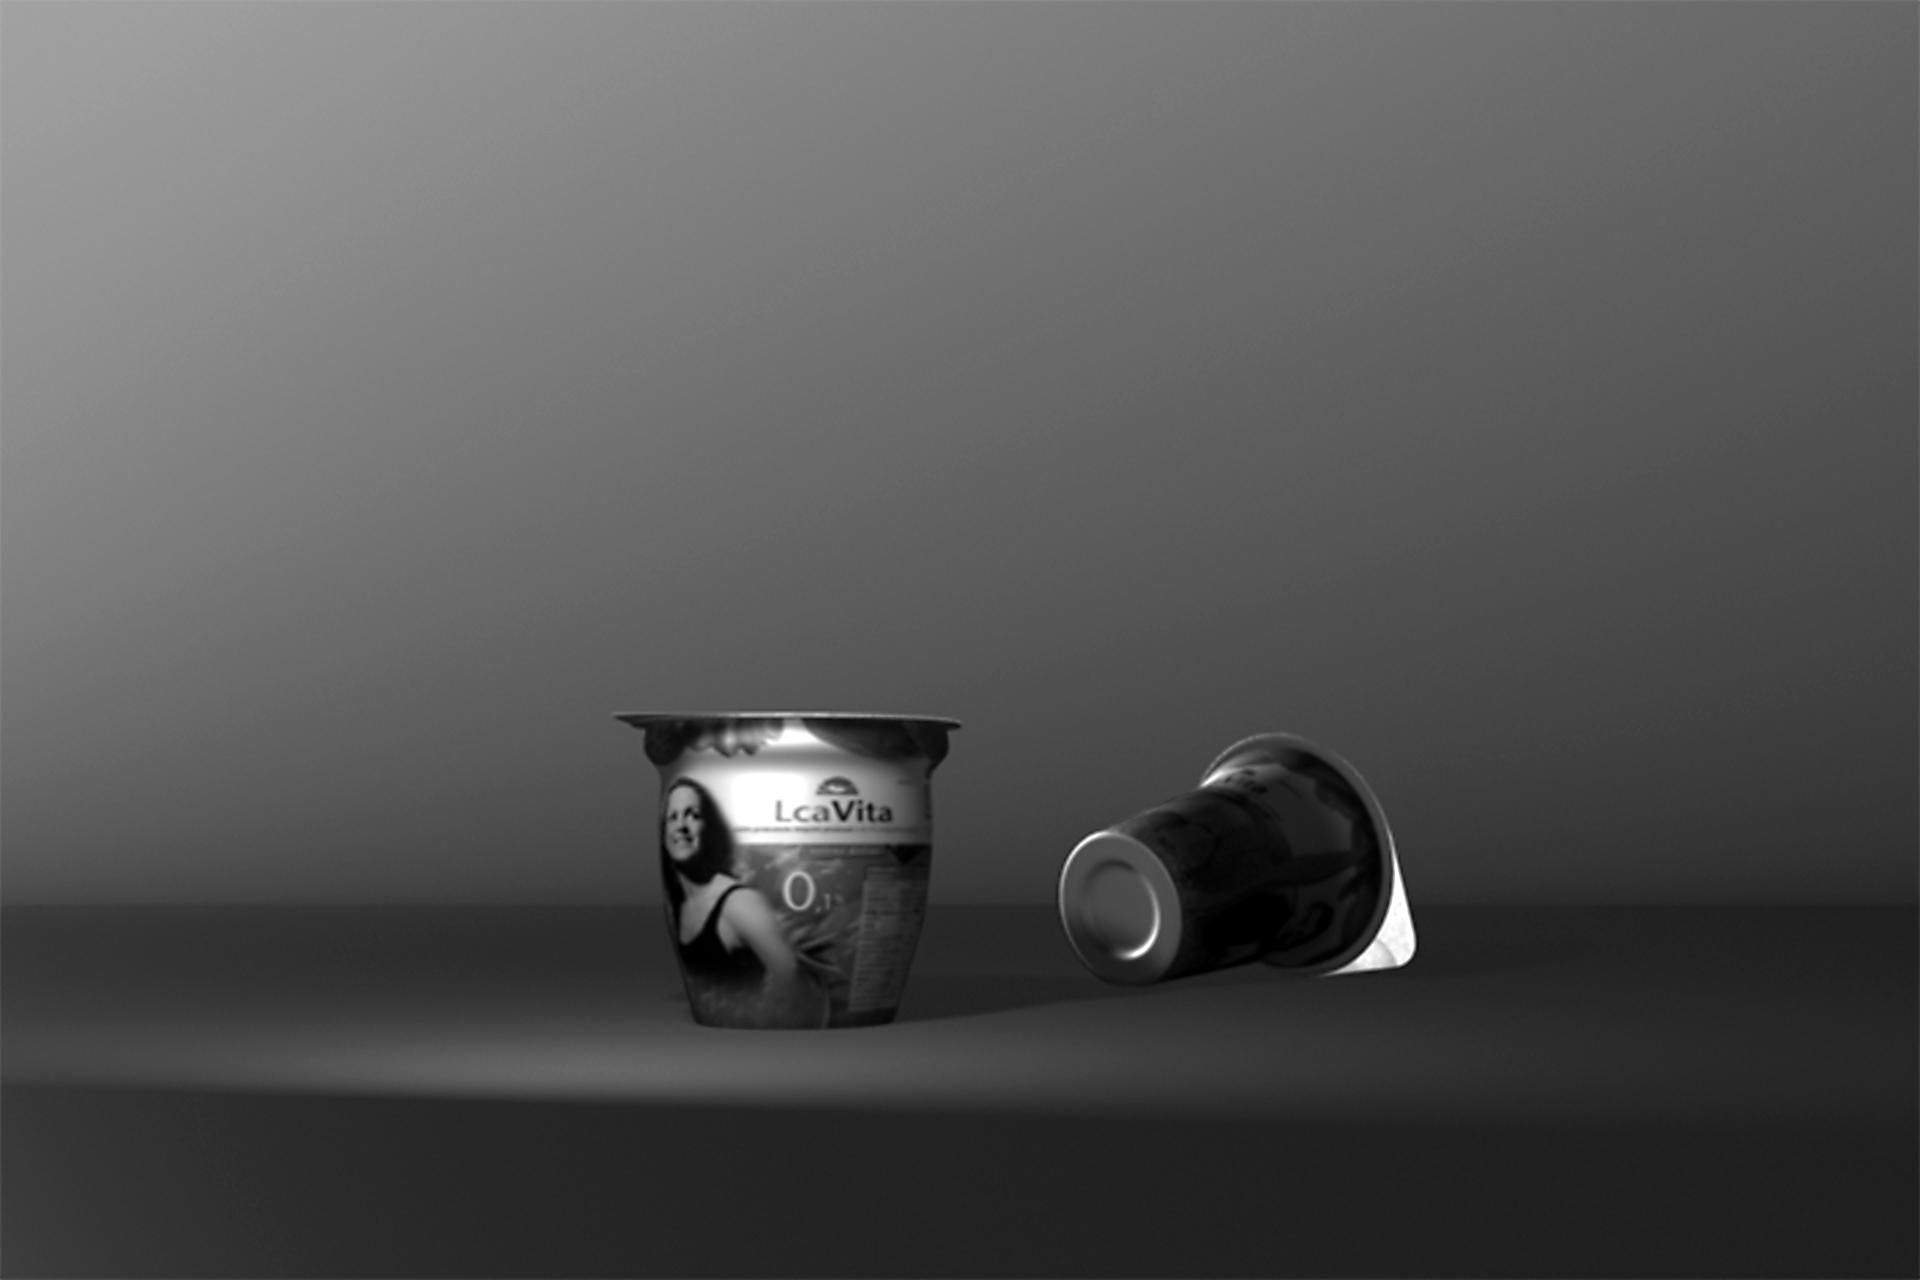 mlekarna_LCA_animacija_marinsek_1_cb